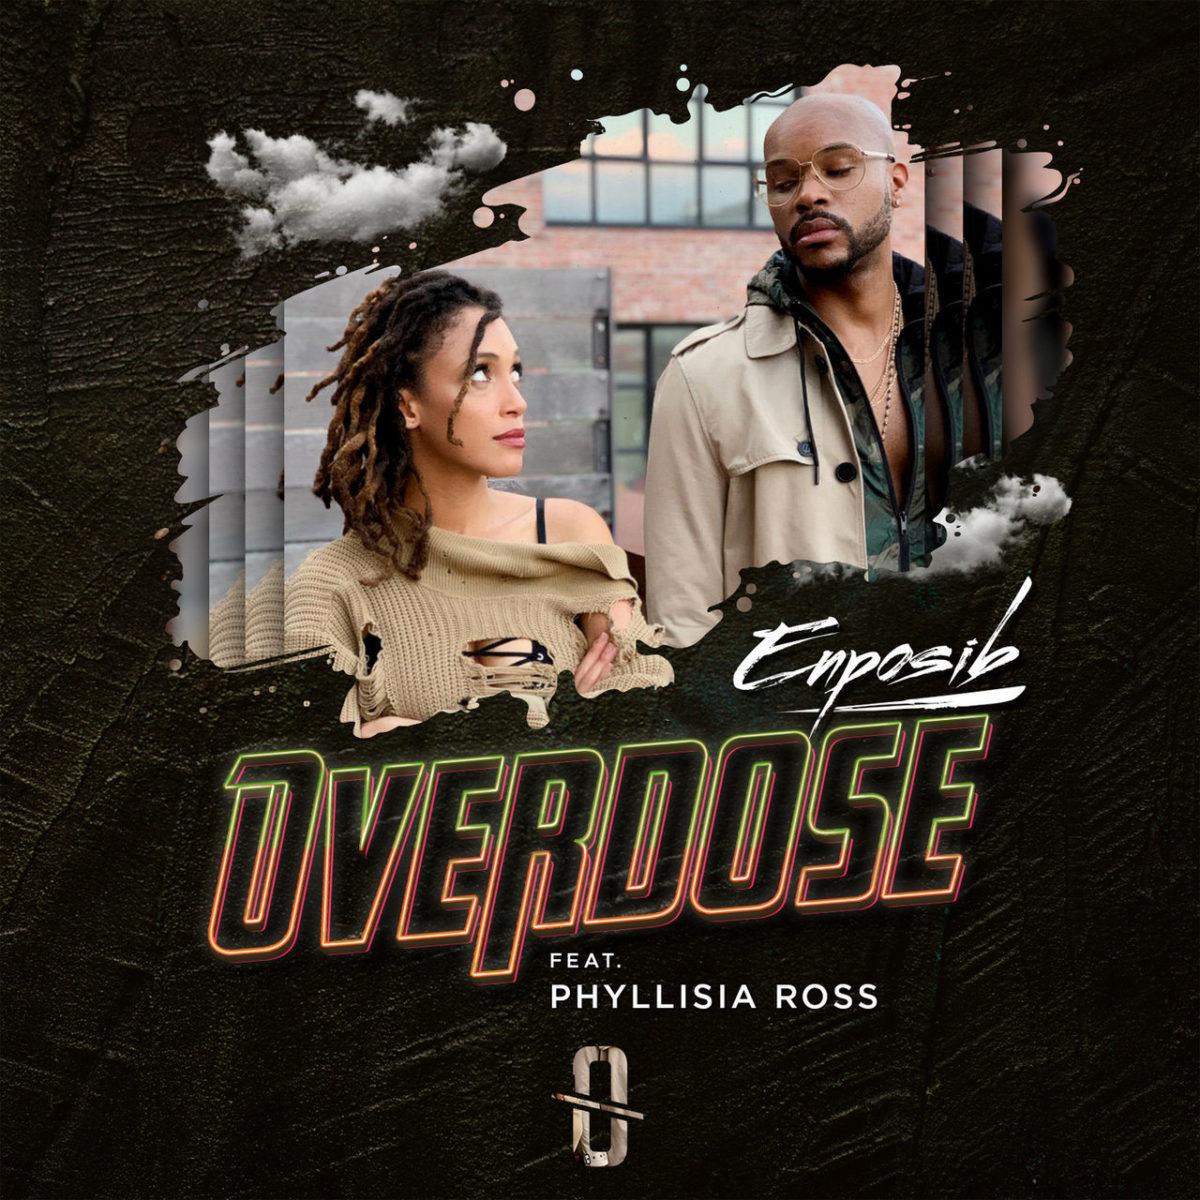 Enposib - Overdose (ft. Phyllisia Ross) (Cover)